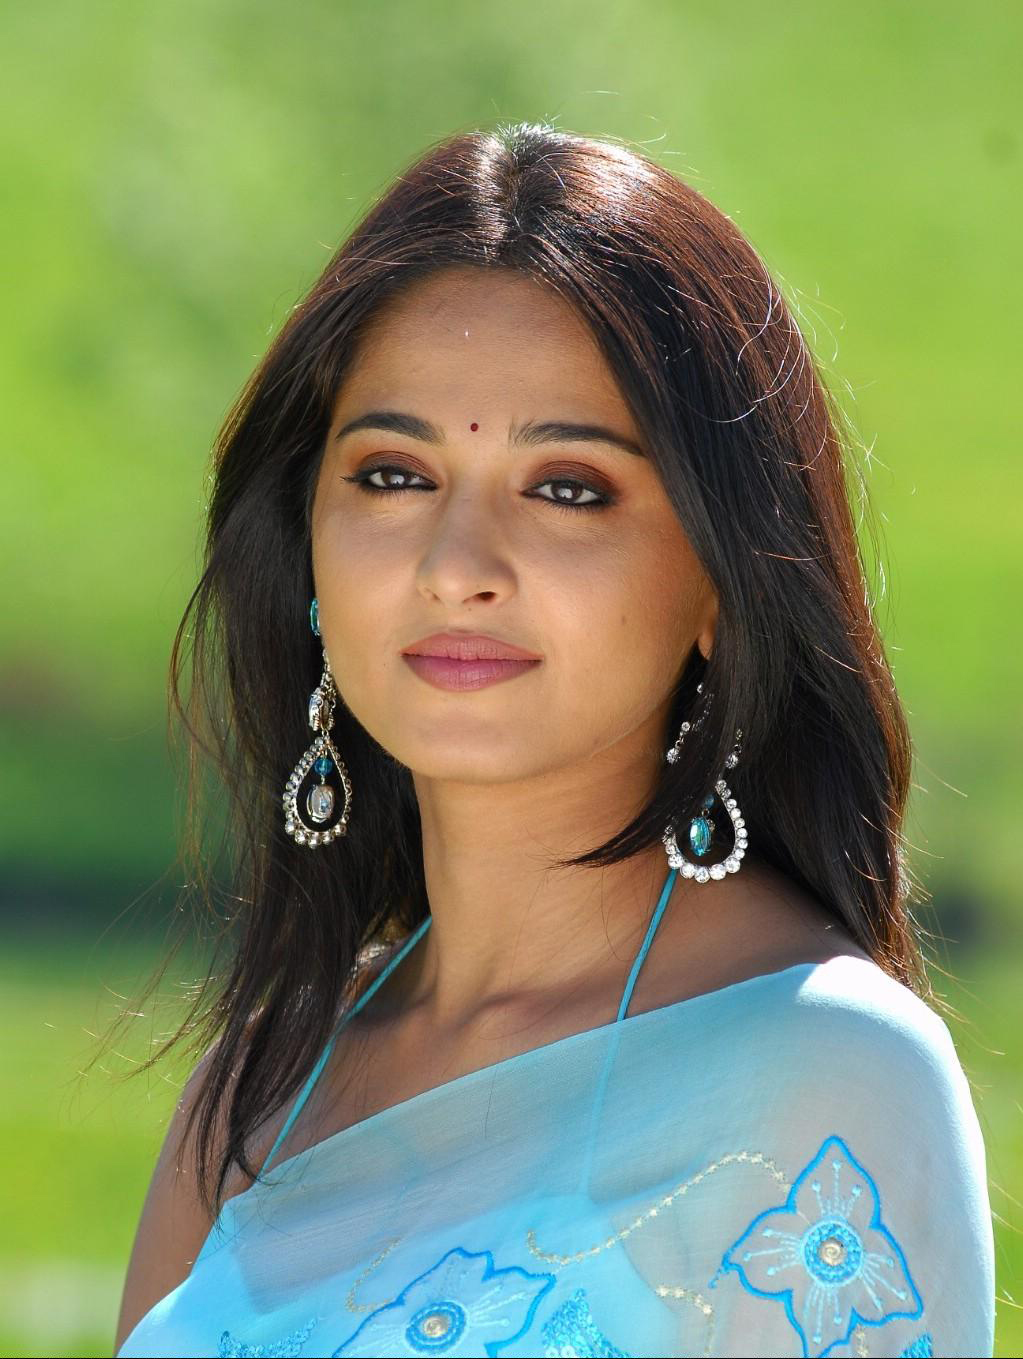 Anushka shetty anushka shetty hot stills pictures beautiful pictures - Anushka Shetty Anushka Shetty